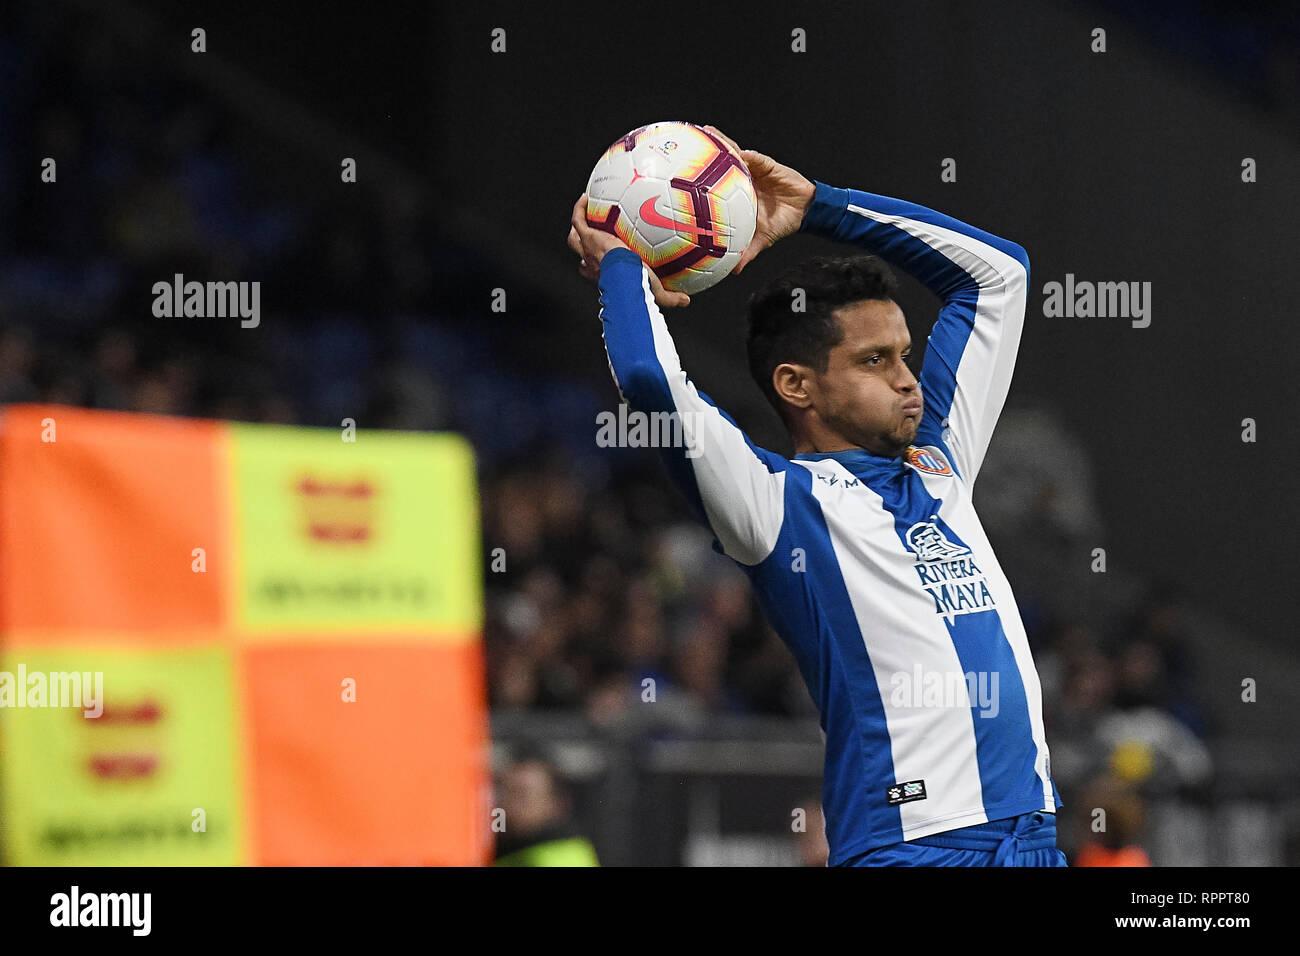 Roberto Rosales of RCD Espanyol during the match between RCD Espanyol vs SD Huesca of La Liga, date 25, 2018-2019 season. RCDE Stadium. Barcelona, Spain - 22 FEB 2019. - Stock Image